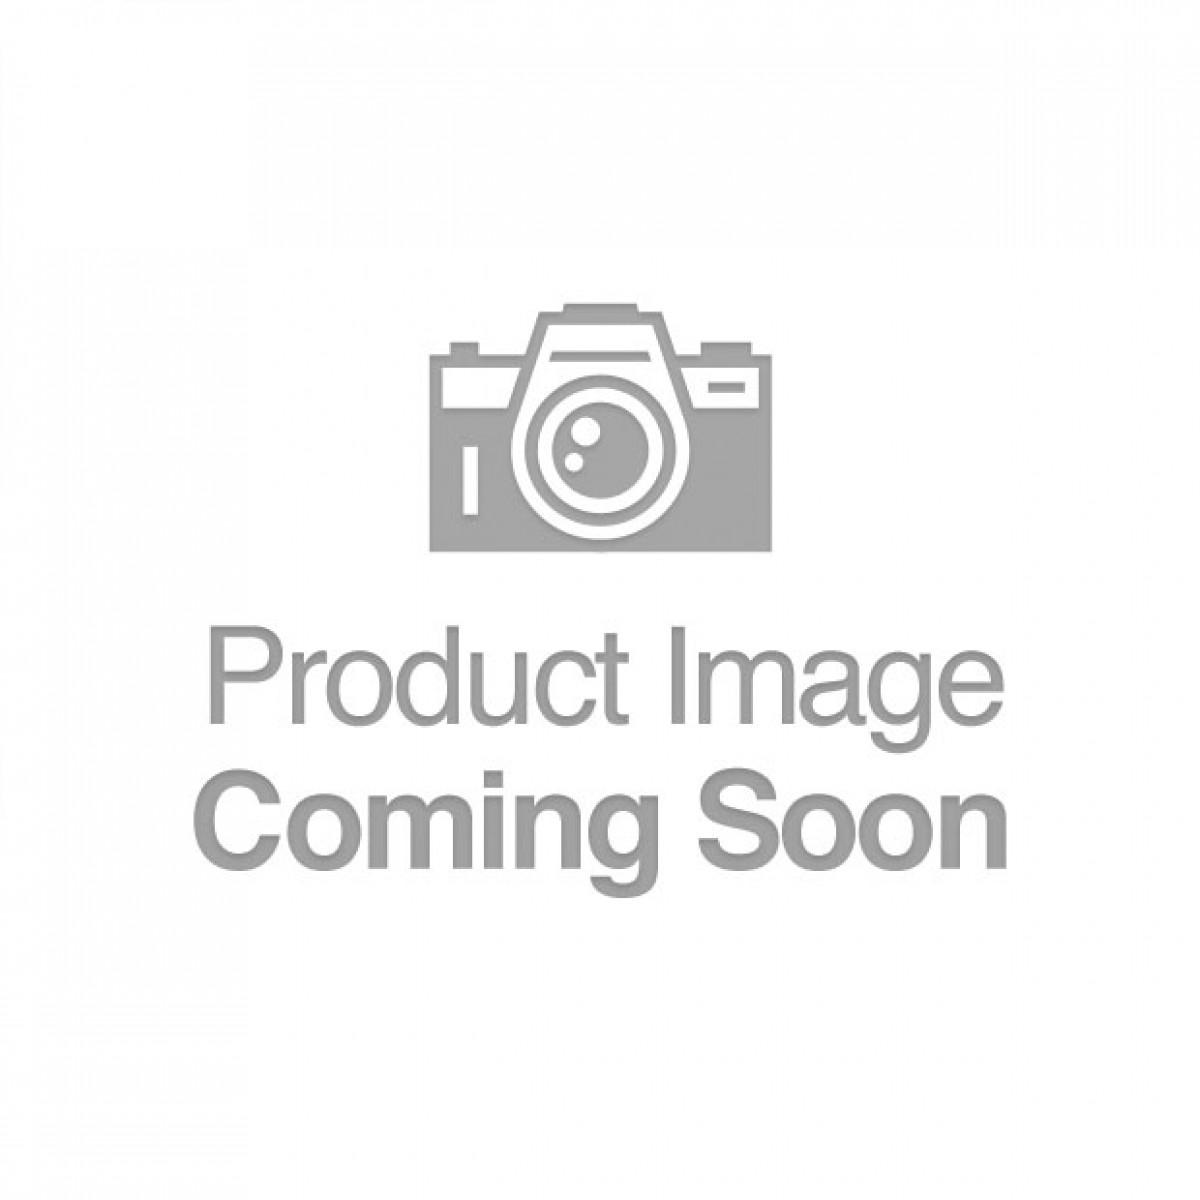 Sensuelle Power Plug 20 Function Remote Control Butt Plug - Ultra Violet